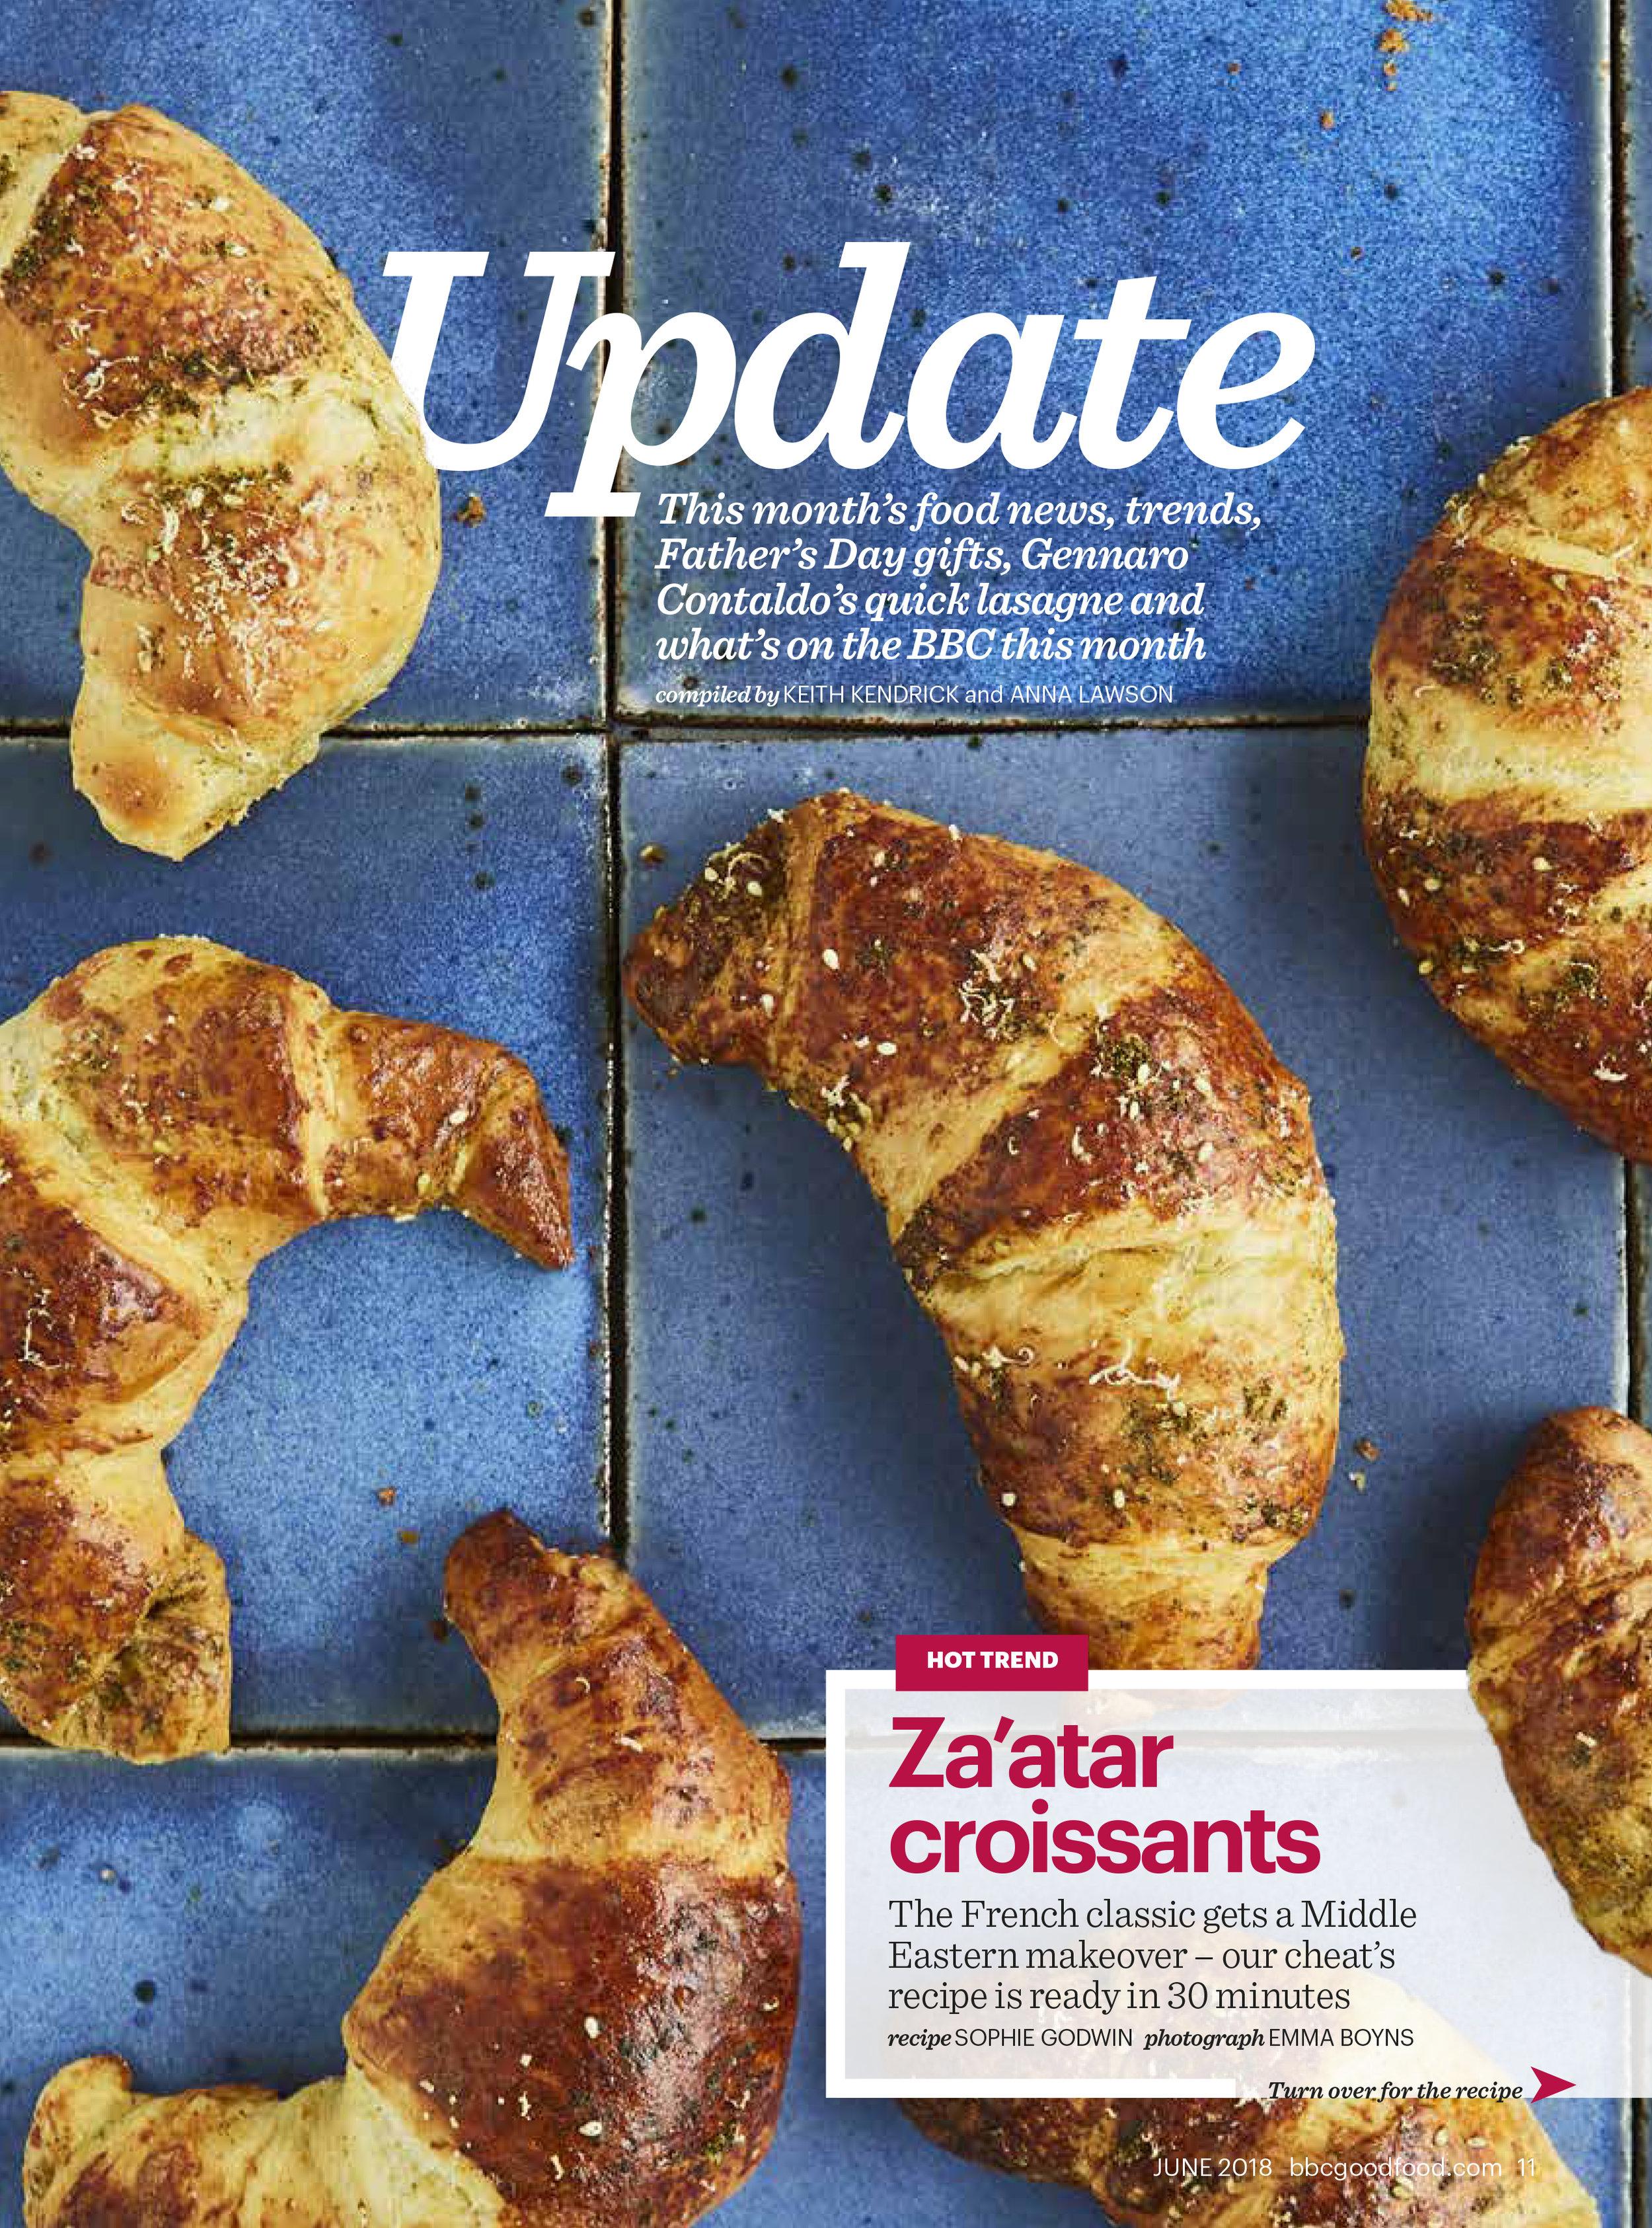 Croissants single cover.jpg